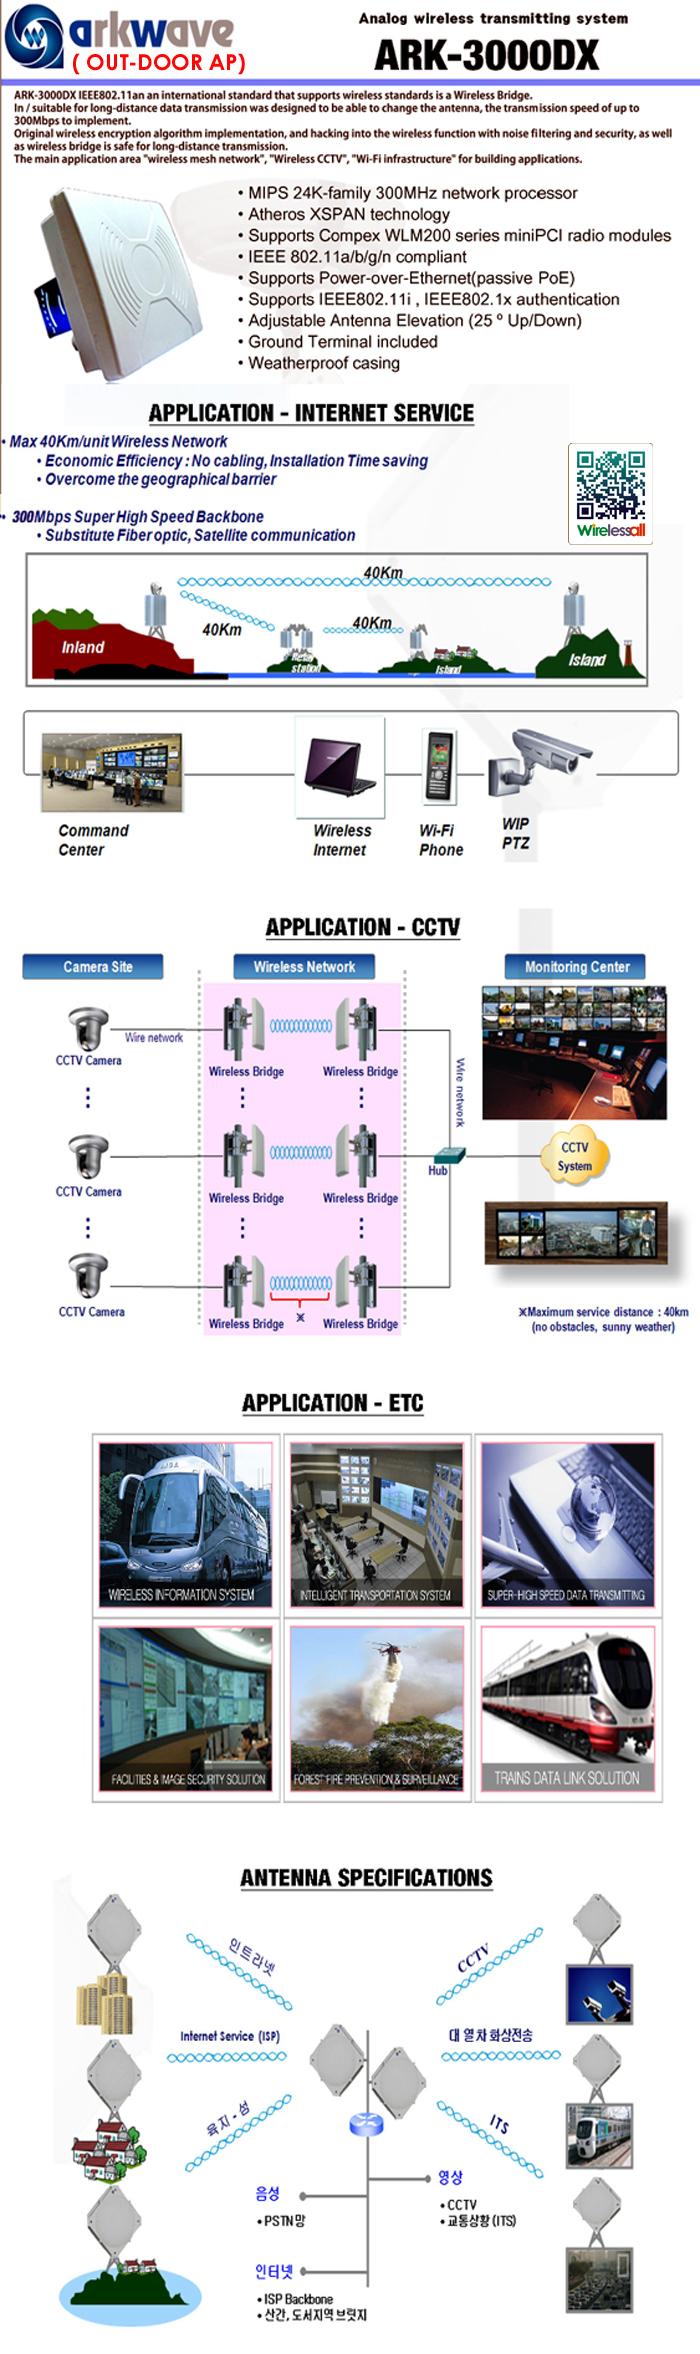 Arkwave ARK-3000DX 무선랜 옥외용 AP 802.11an 지원, 옥외용 AP